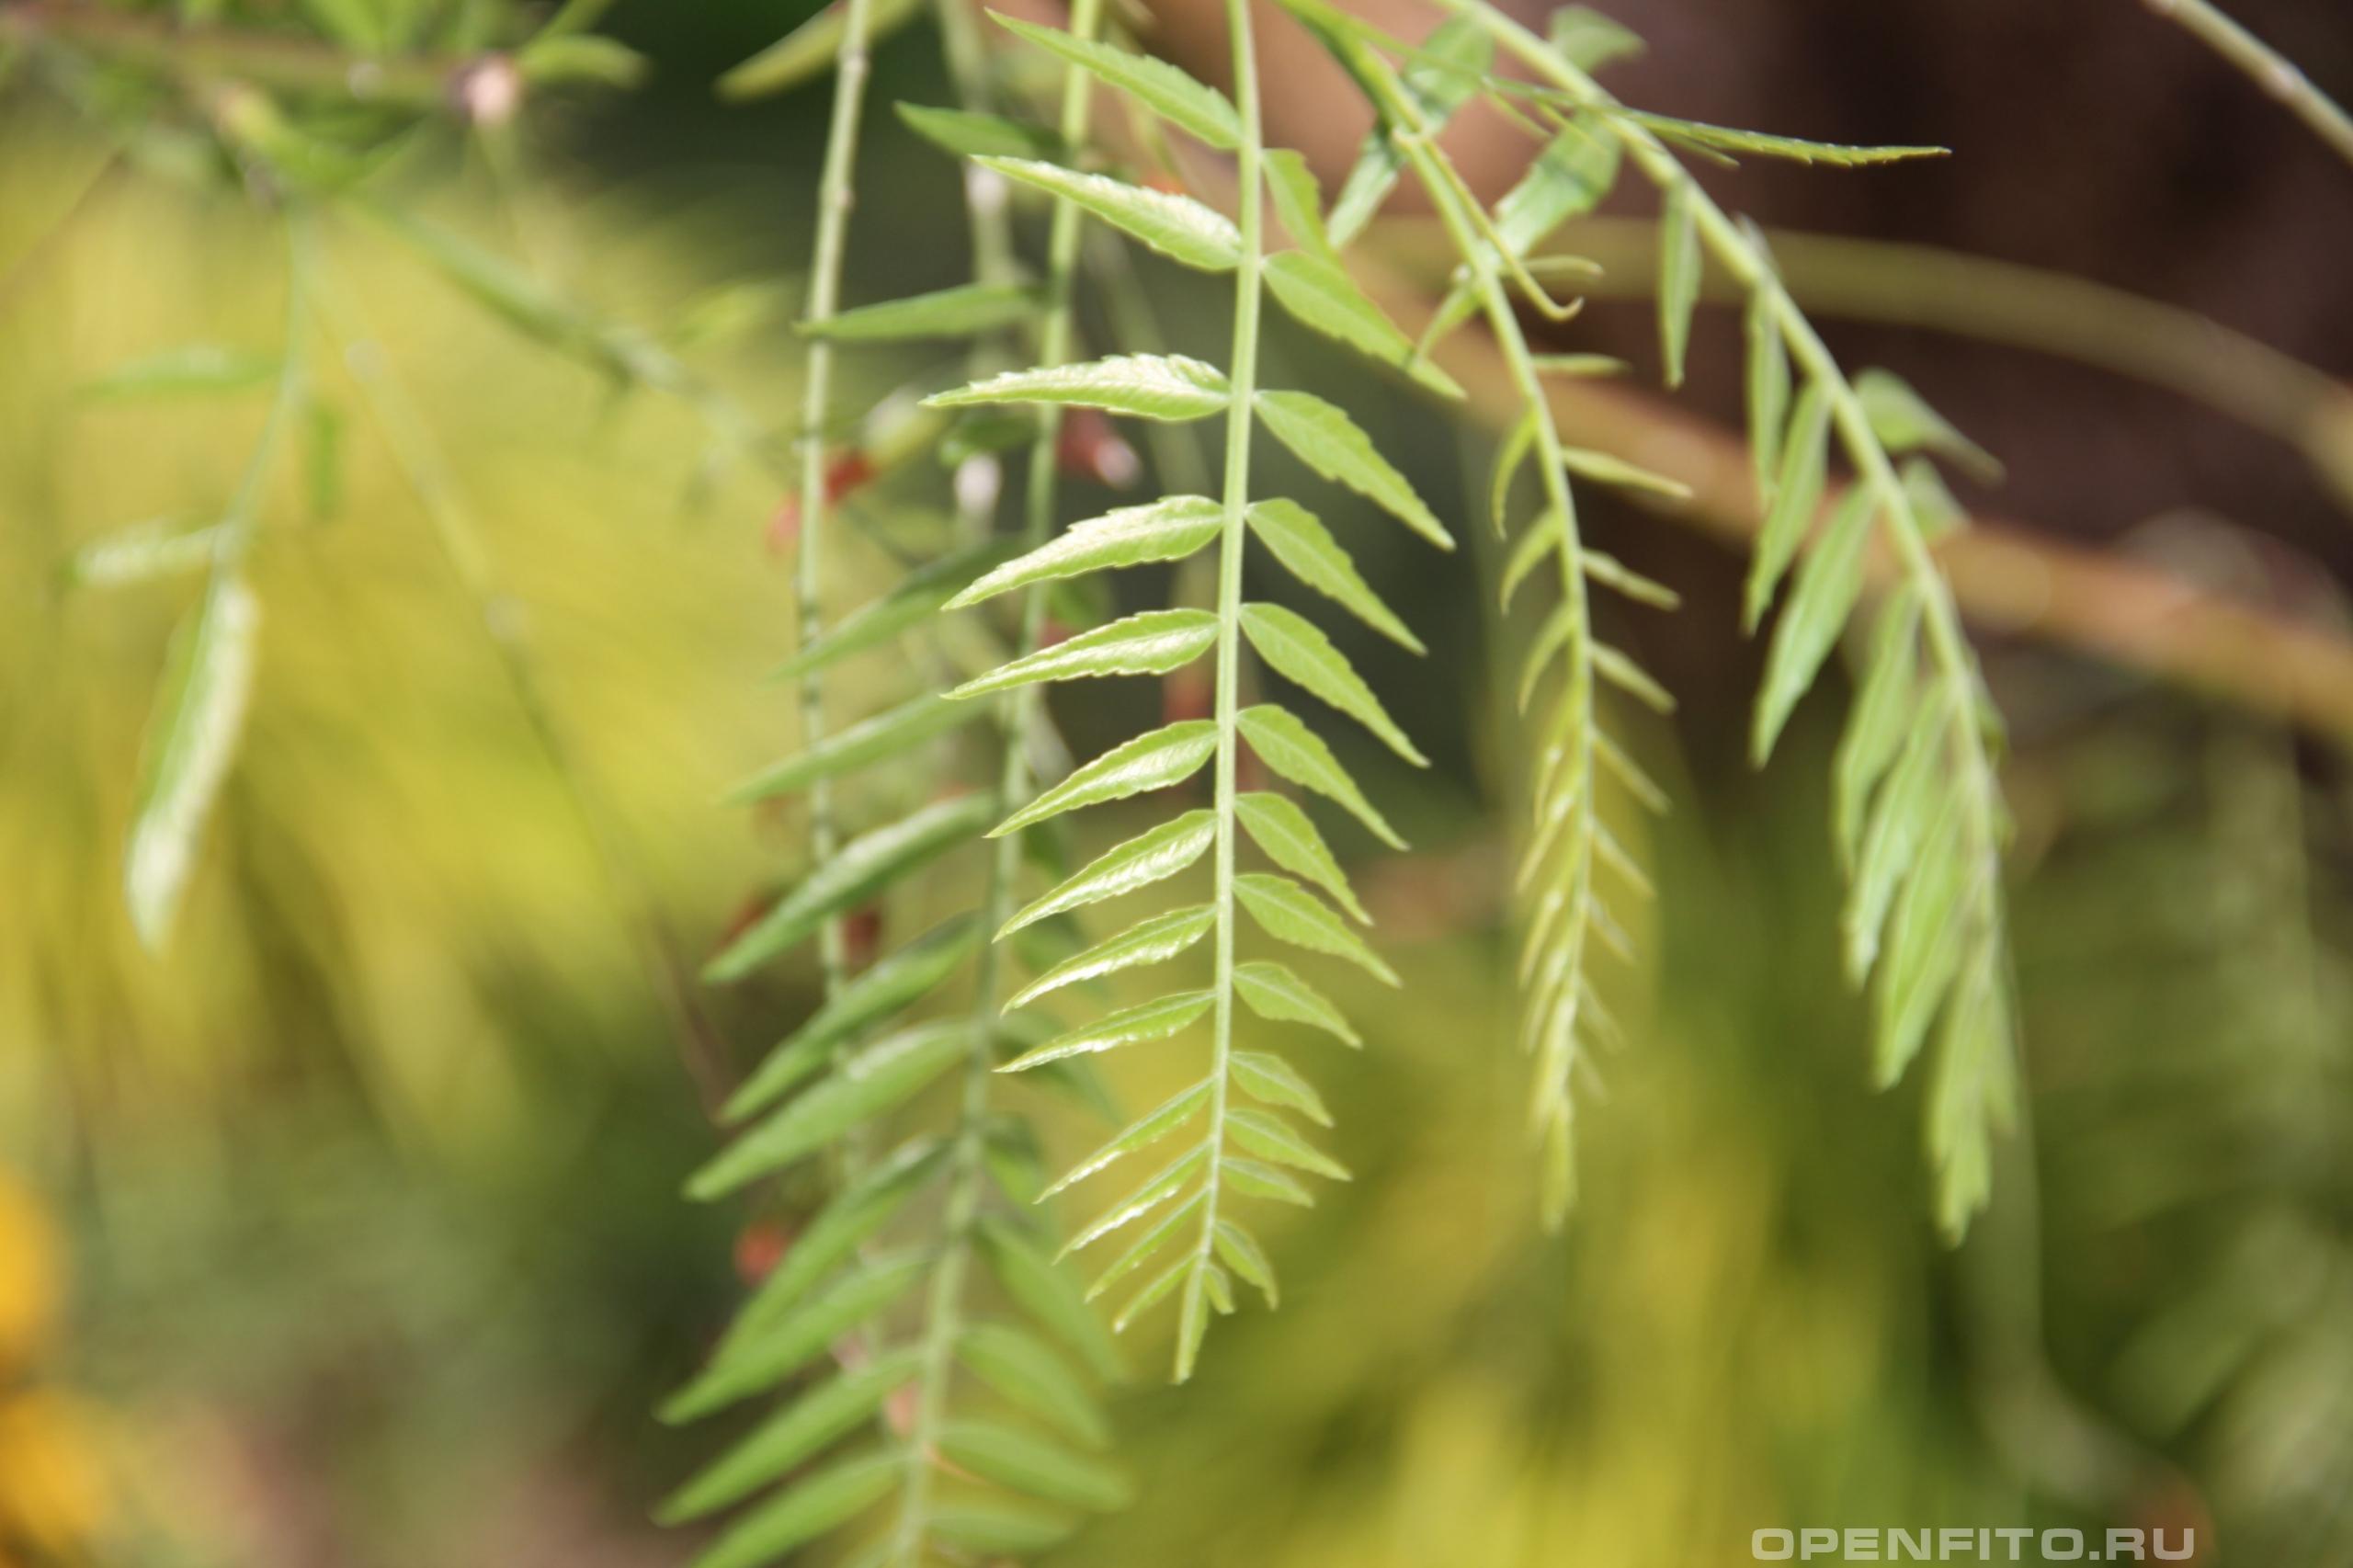 Шинус мягкий молодой лист